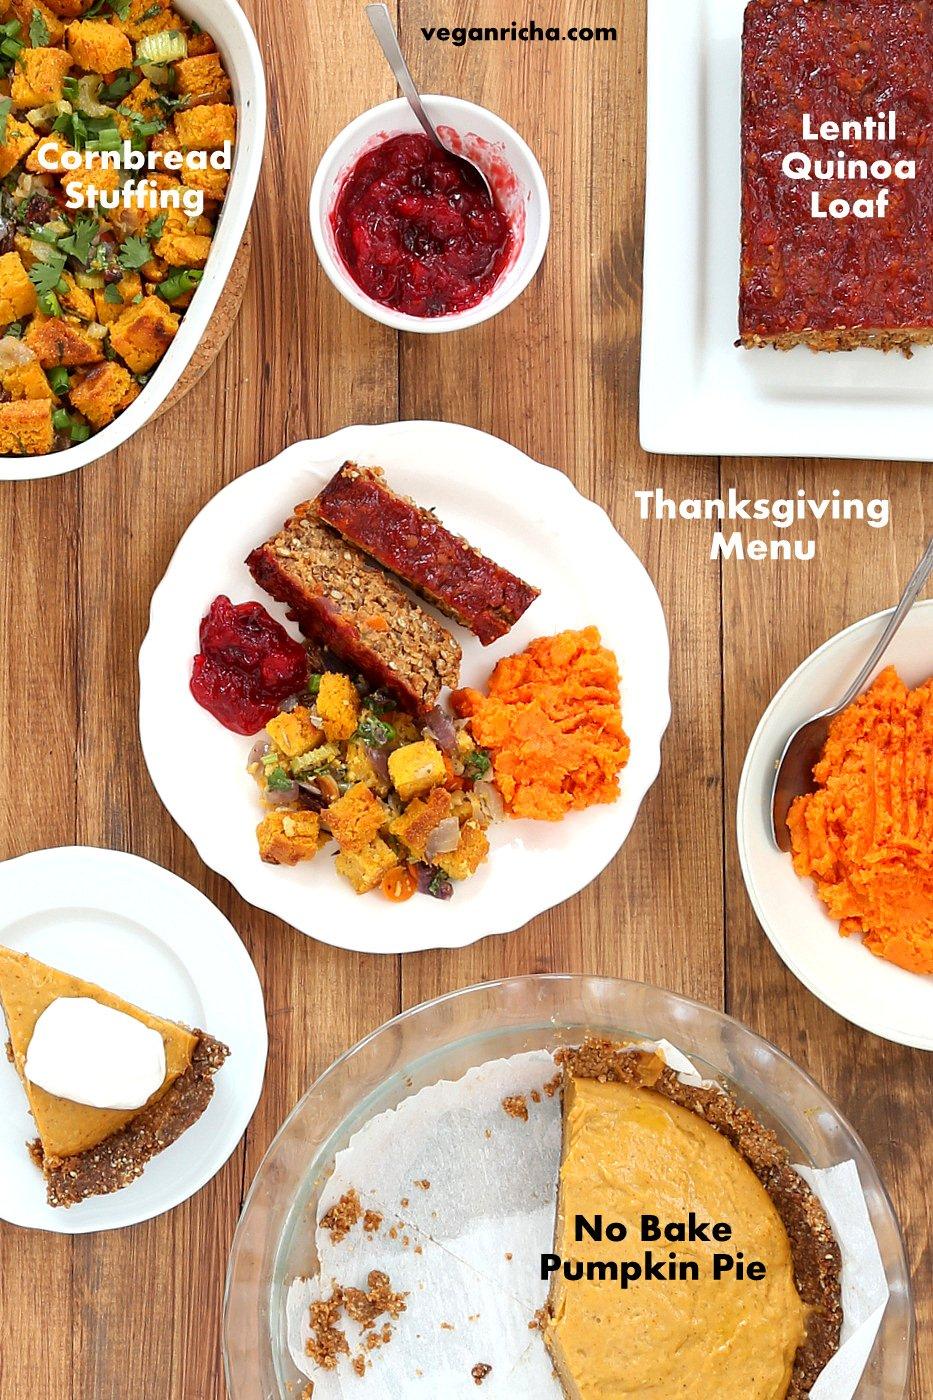 Vegan Thanksgiving Menu Vegan Richa